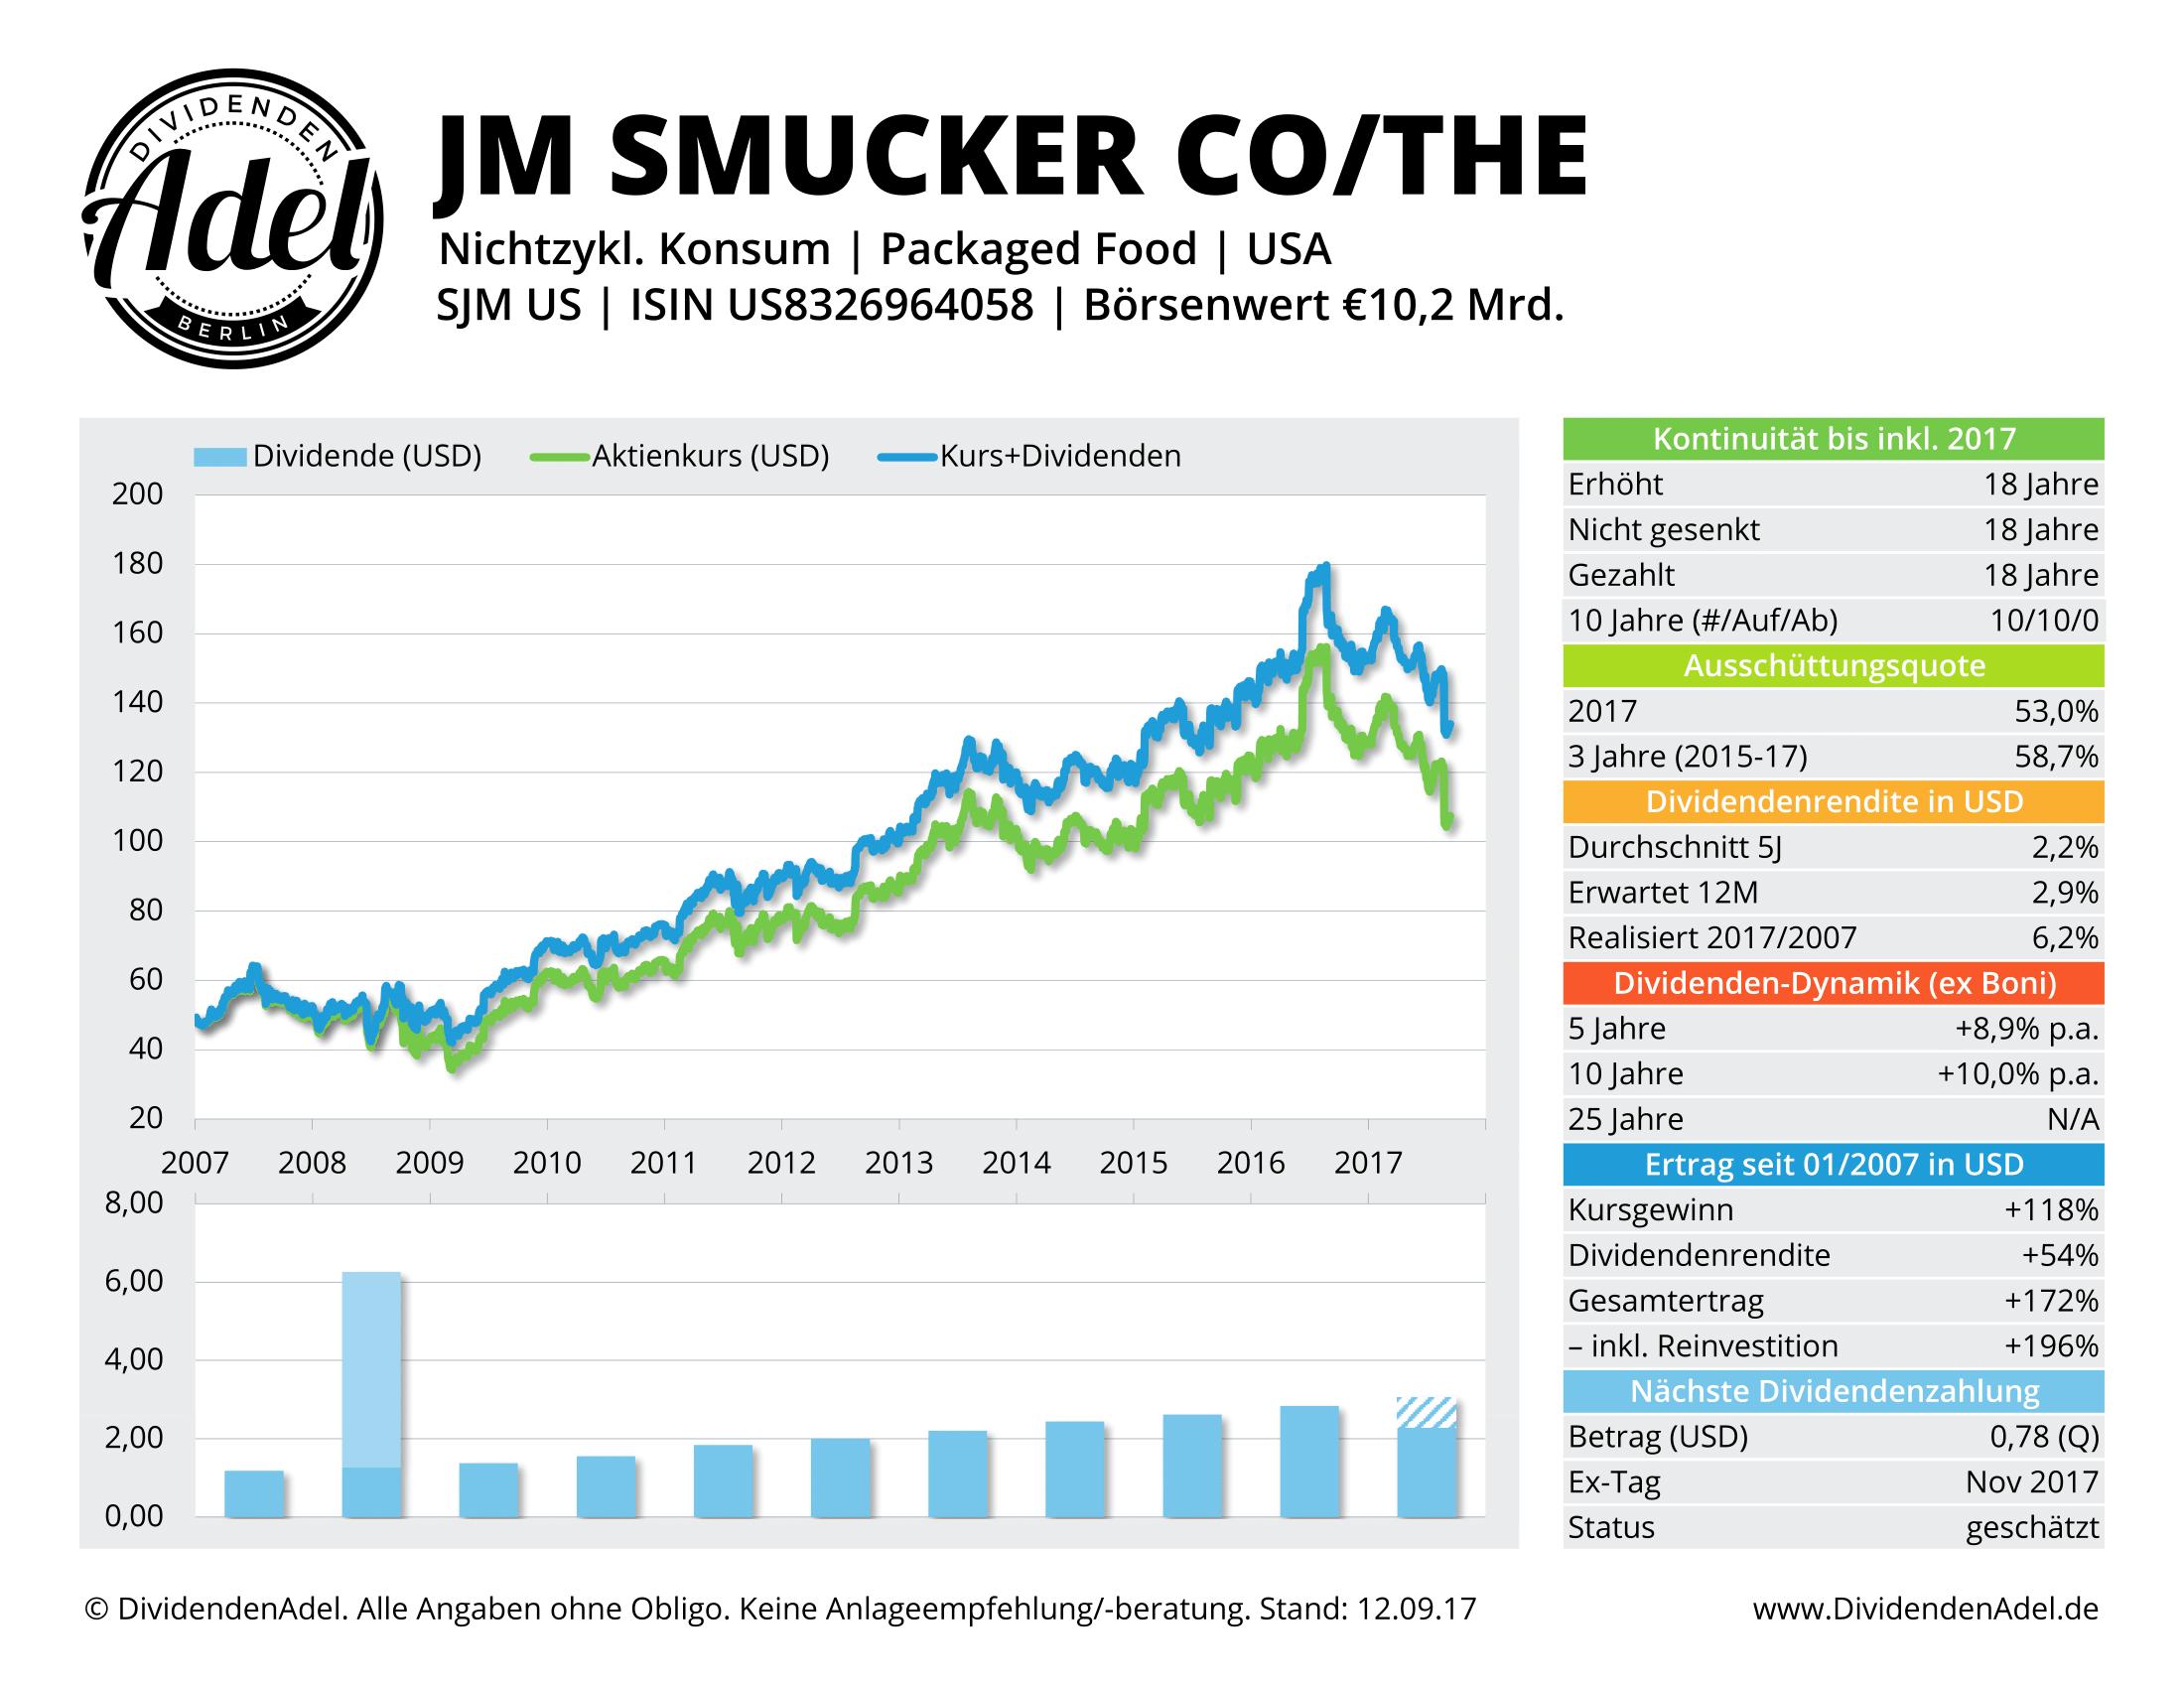 JM SMUCKER CO DividendenAdel-Profil